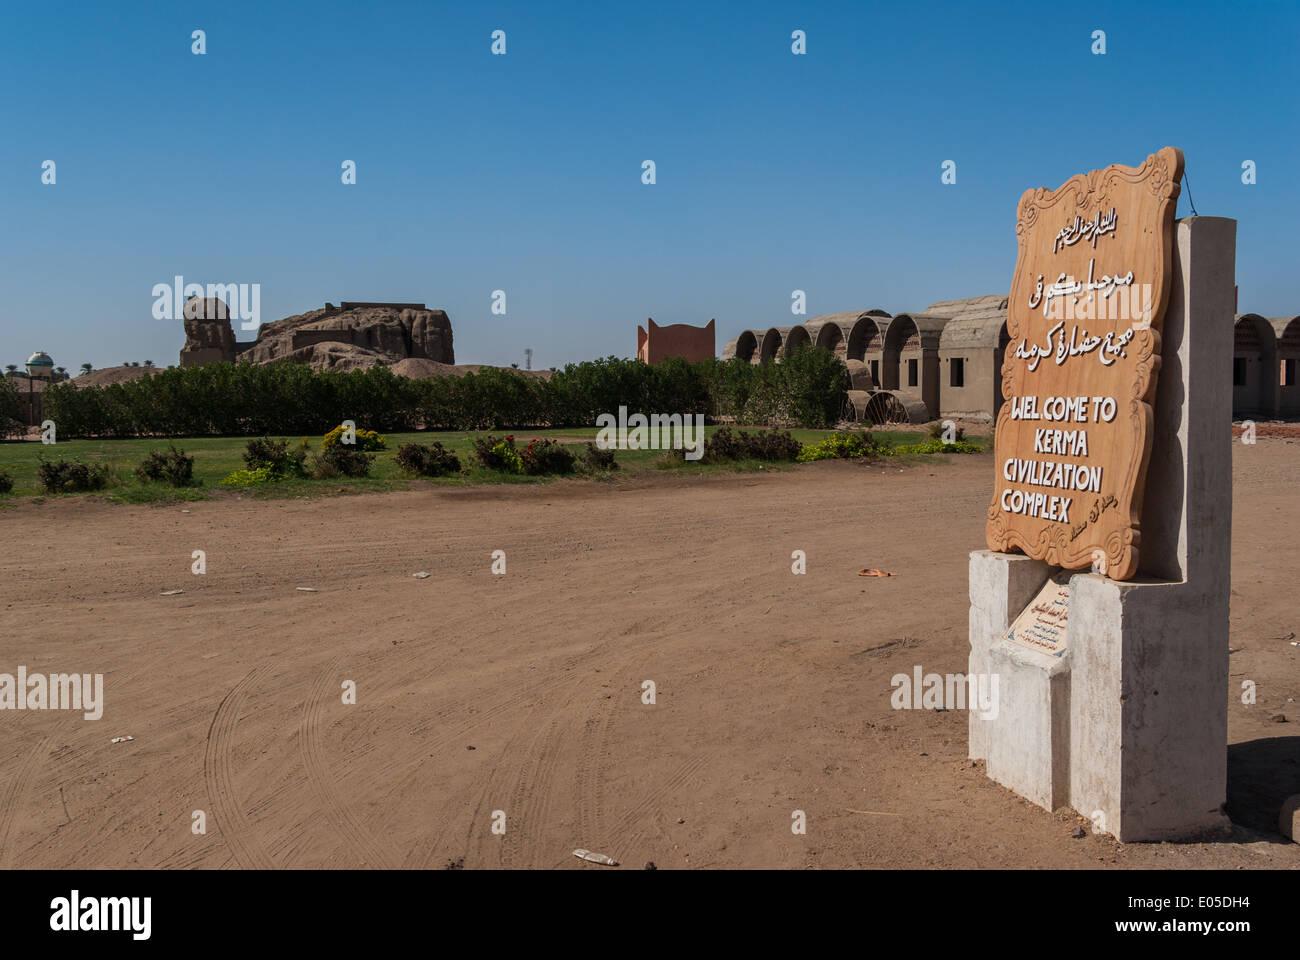 Kerma Civilization Complex Museum and Western Deffufa, Kerma, northern Sudan - Stock Image